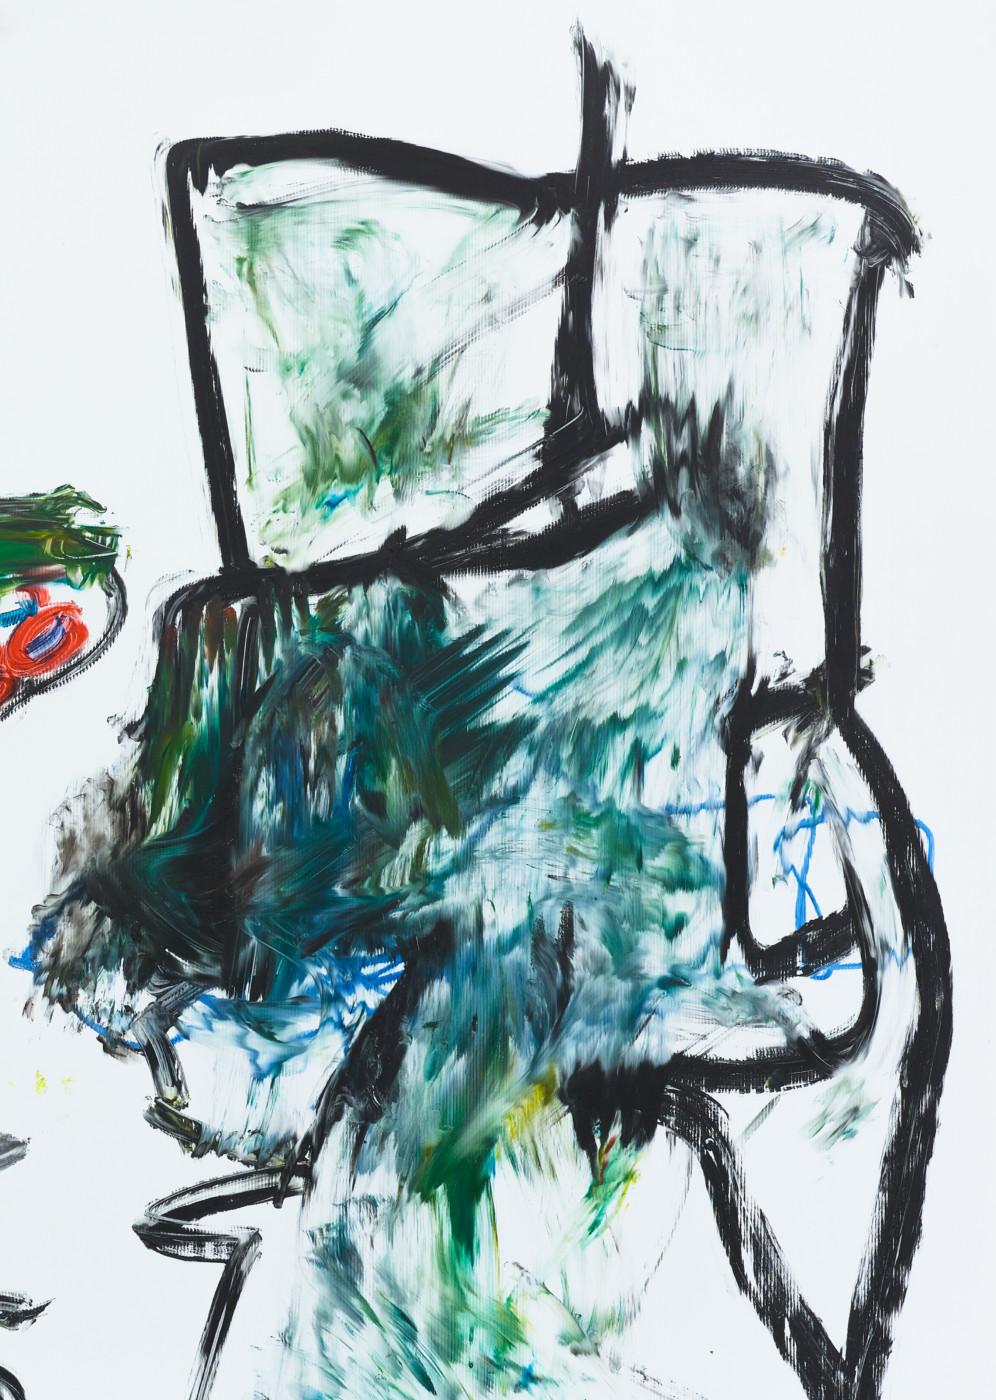 AARON GARBER-MAIKOVSKA  Untitled  (detail), 2018  Oil on fluted polyboard in artist frame  228,6 x 203,2 cm / 90 x 80 in  Aaron Garber-Maikovska